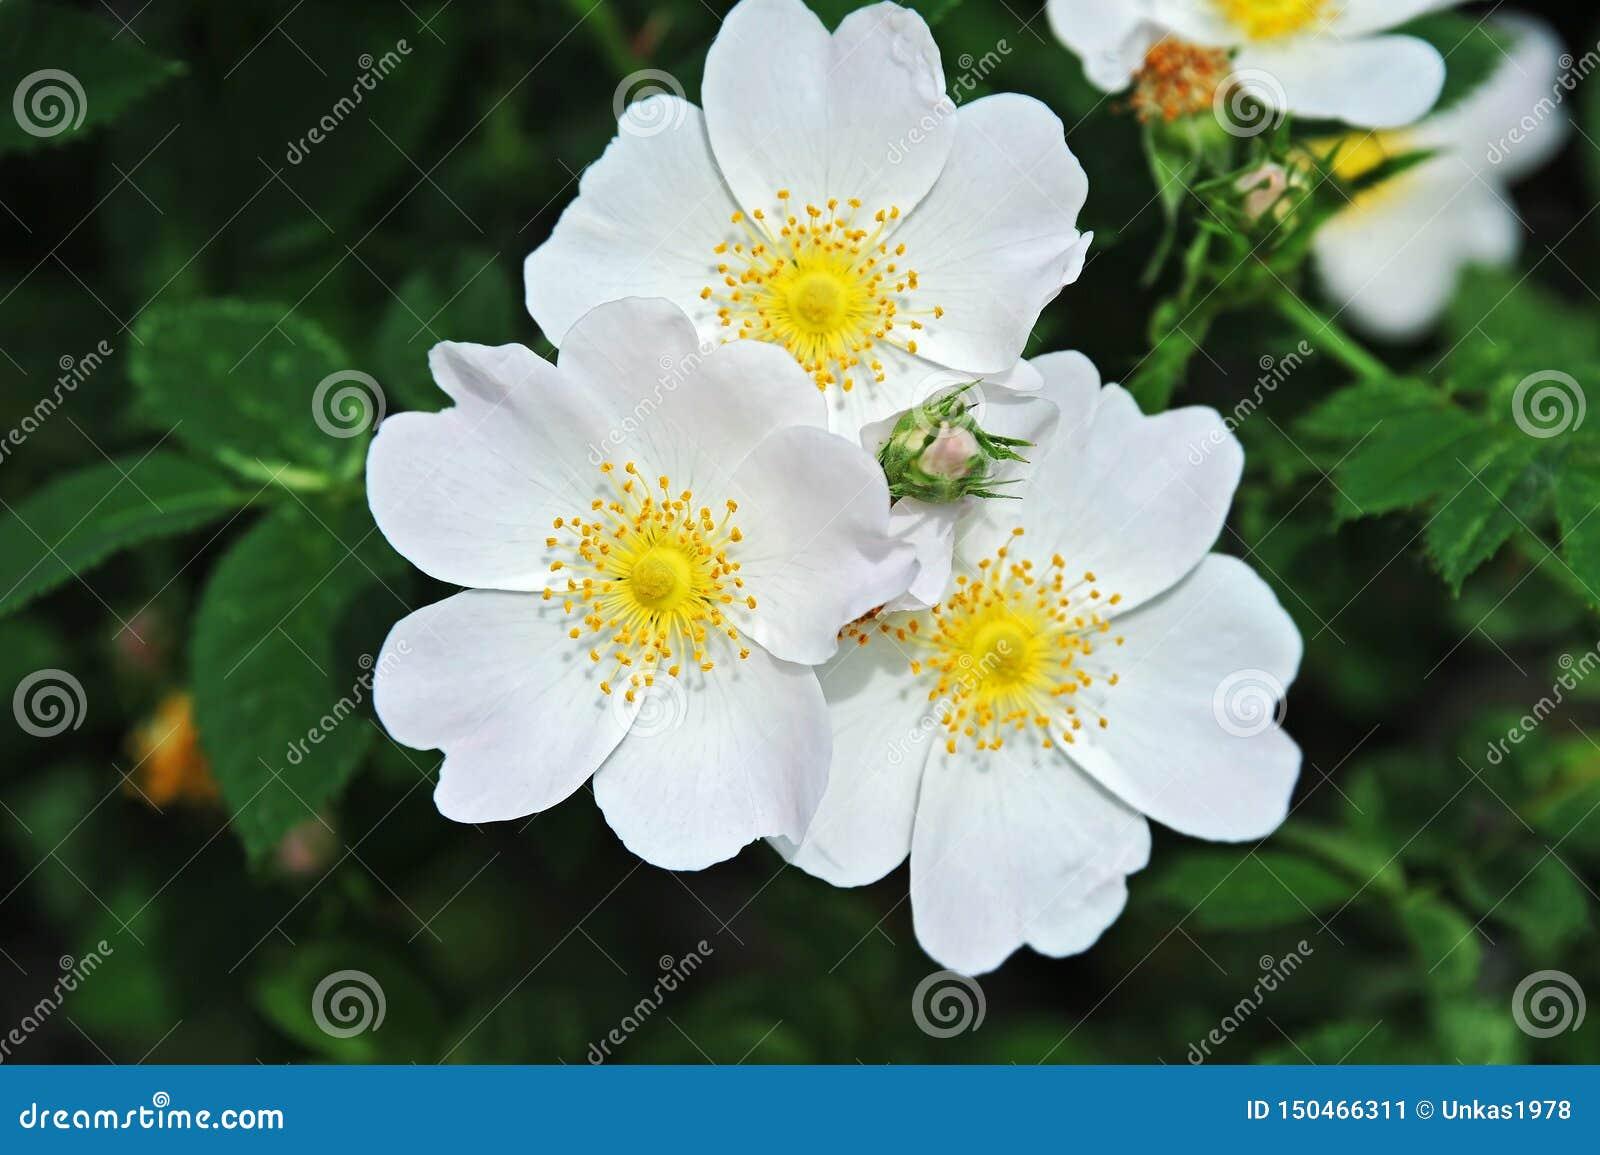 Rosa odorata flower